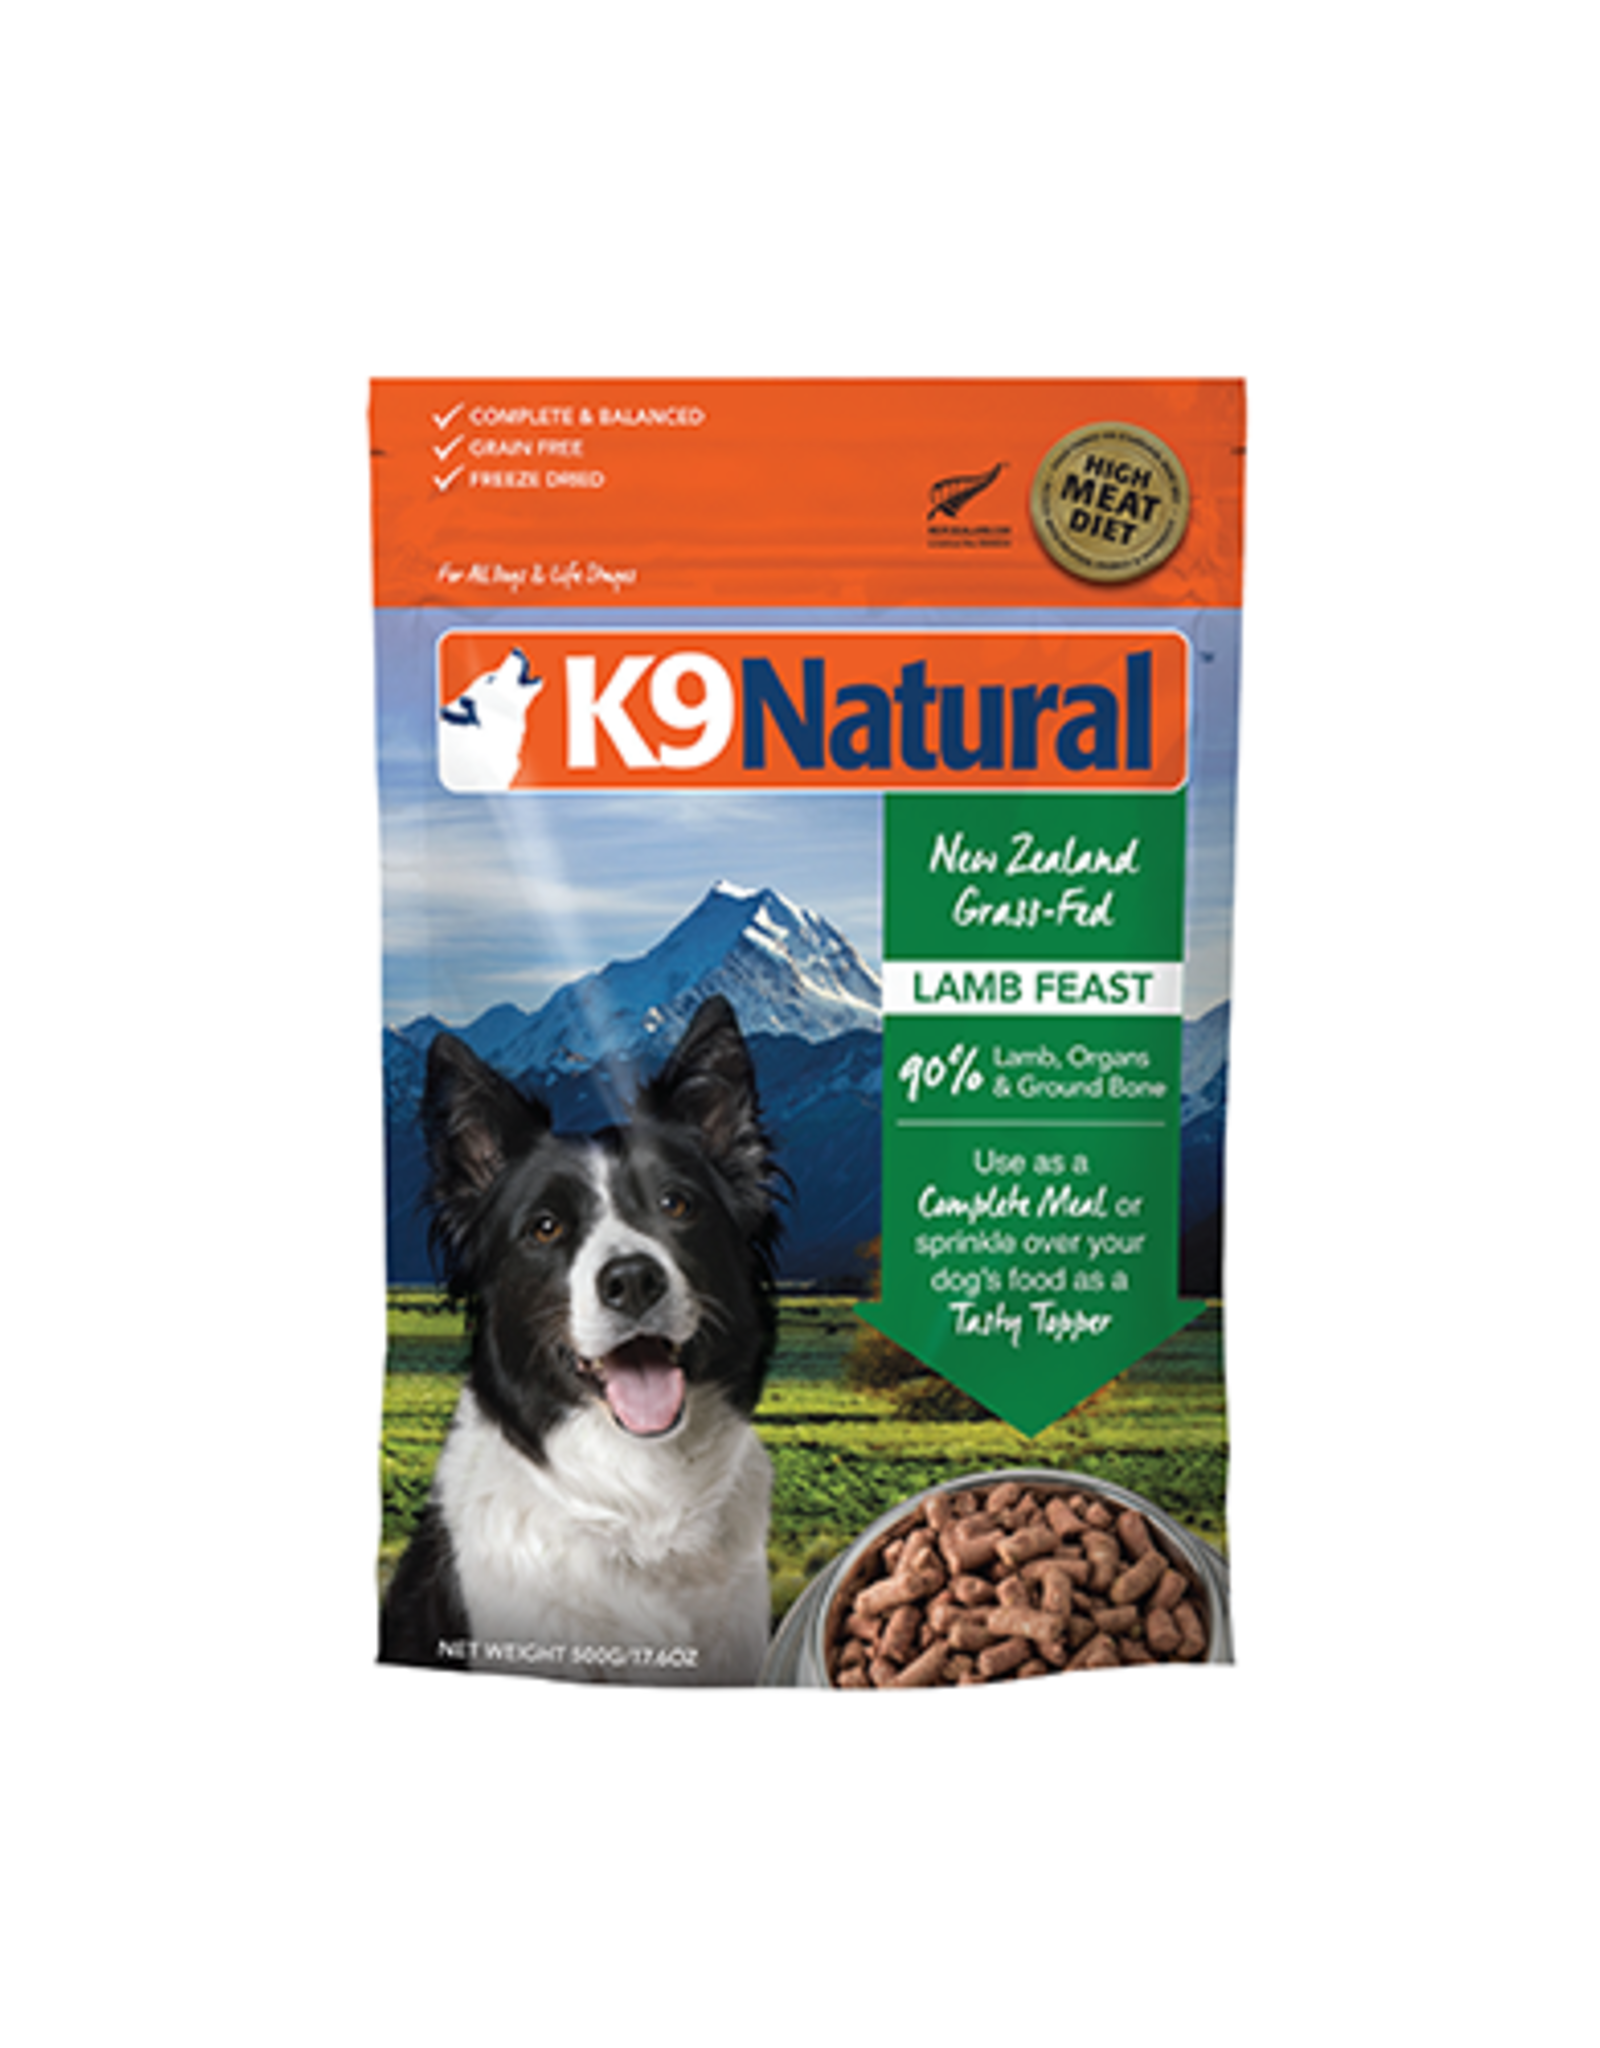 k9 Natural K9 natural lamb feast 500g